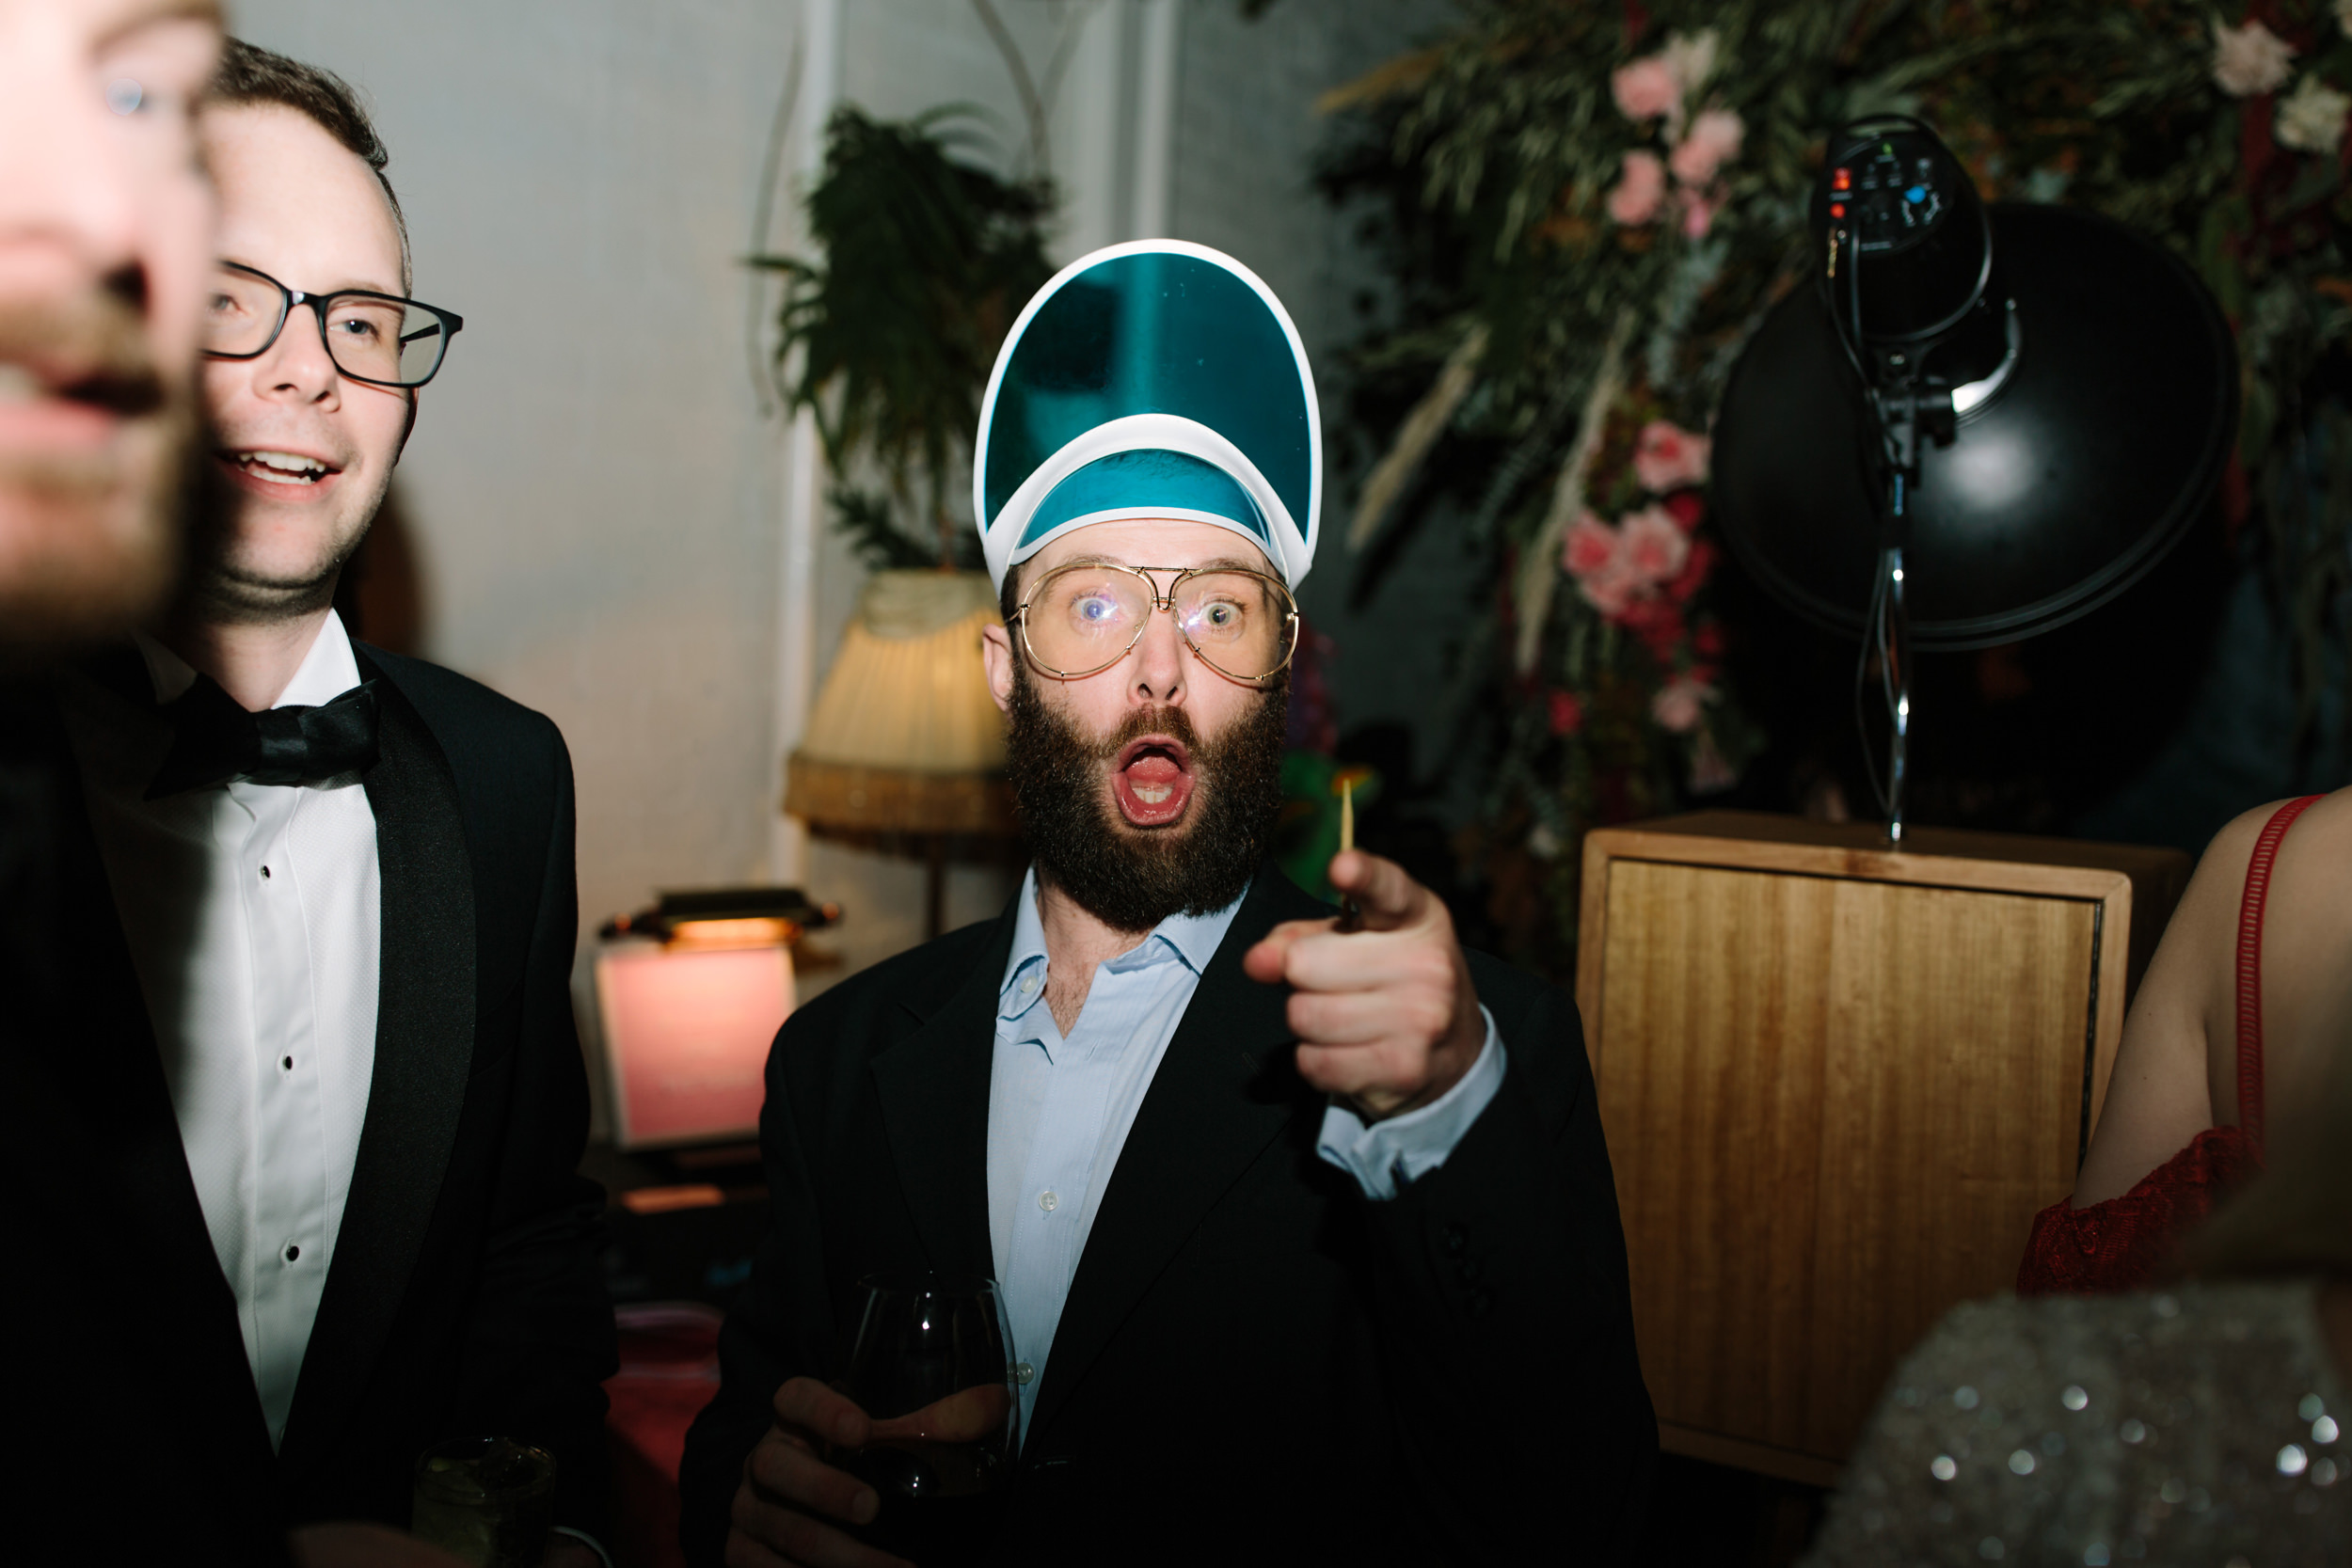 I-Got-You-Babe-Weddings-Tori-Will-Rupert0184.JPG